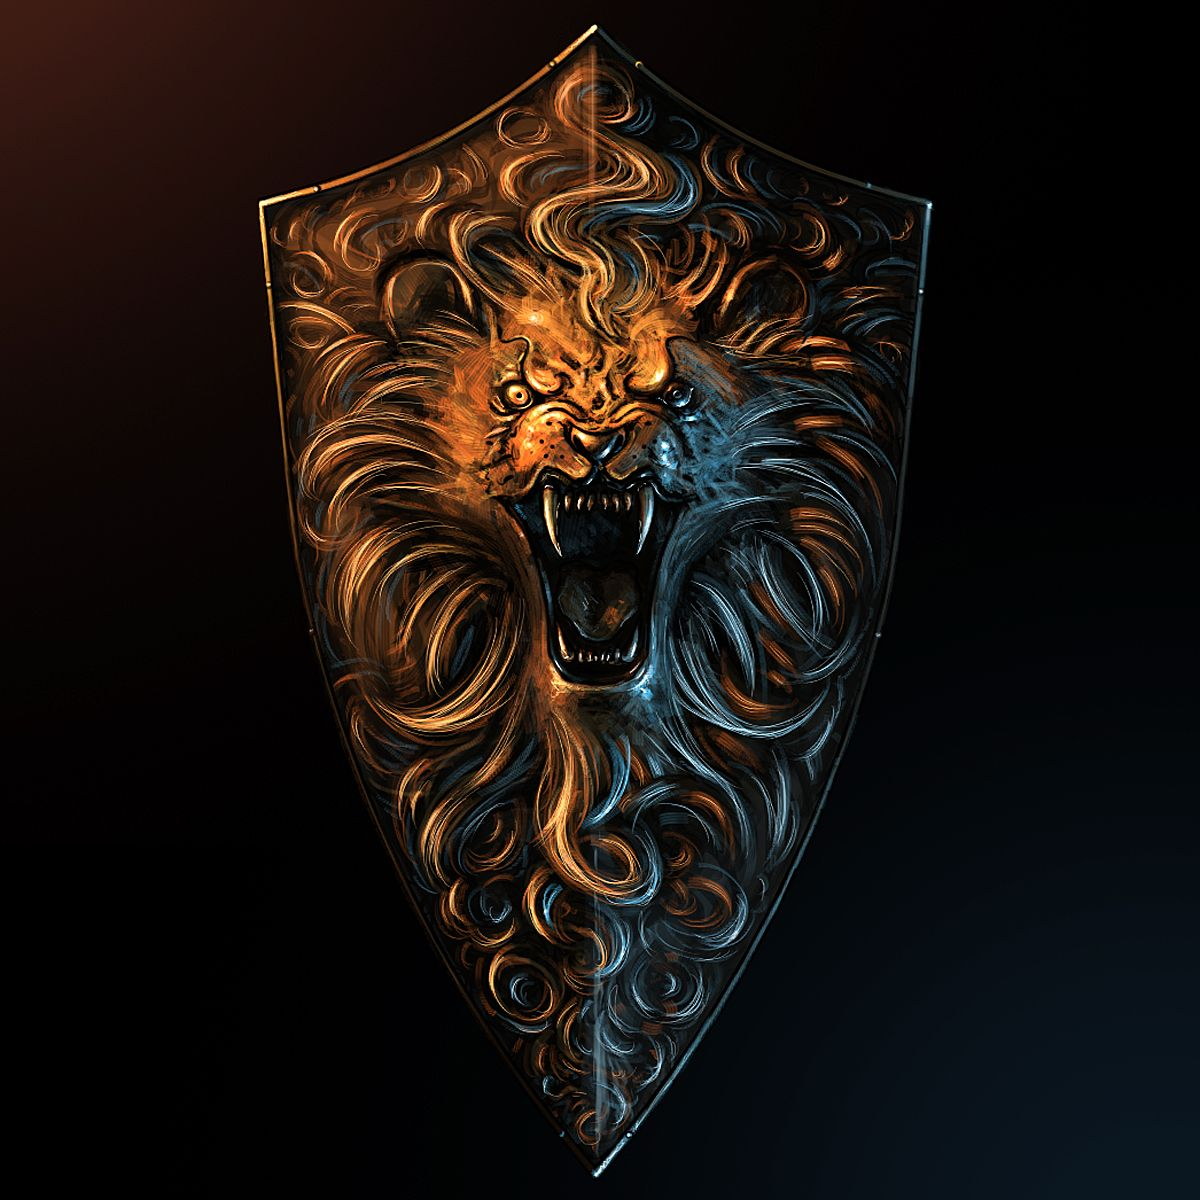 Shield Designs The Best of Dark Souls 2′s Shield Design